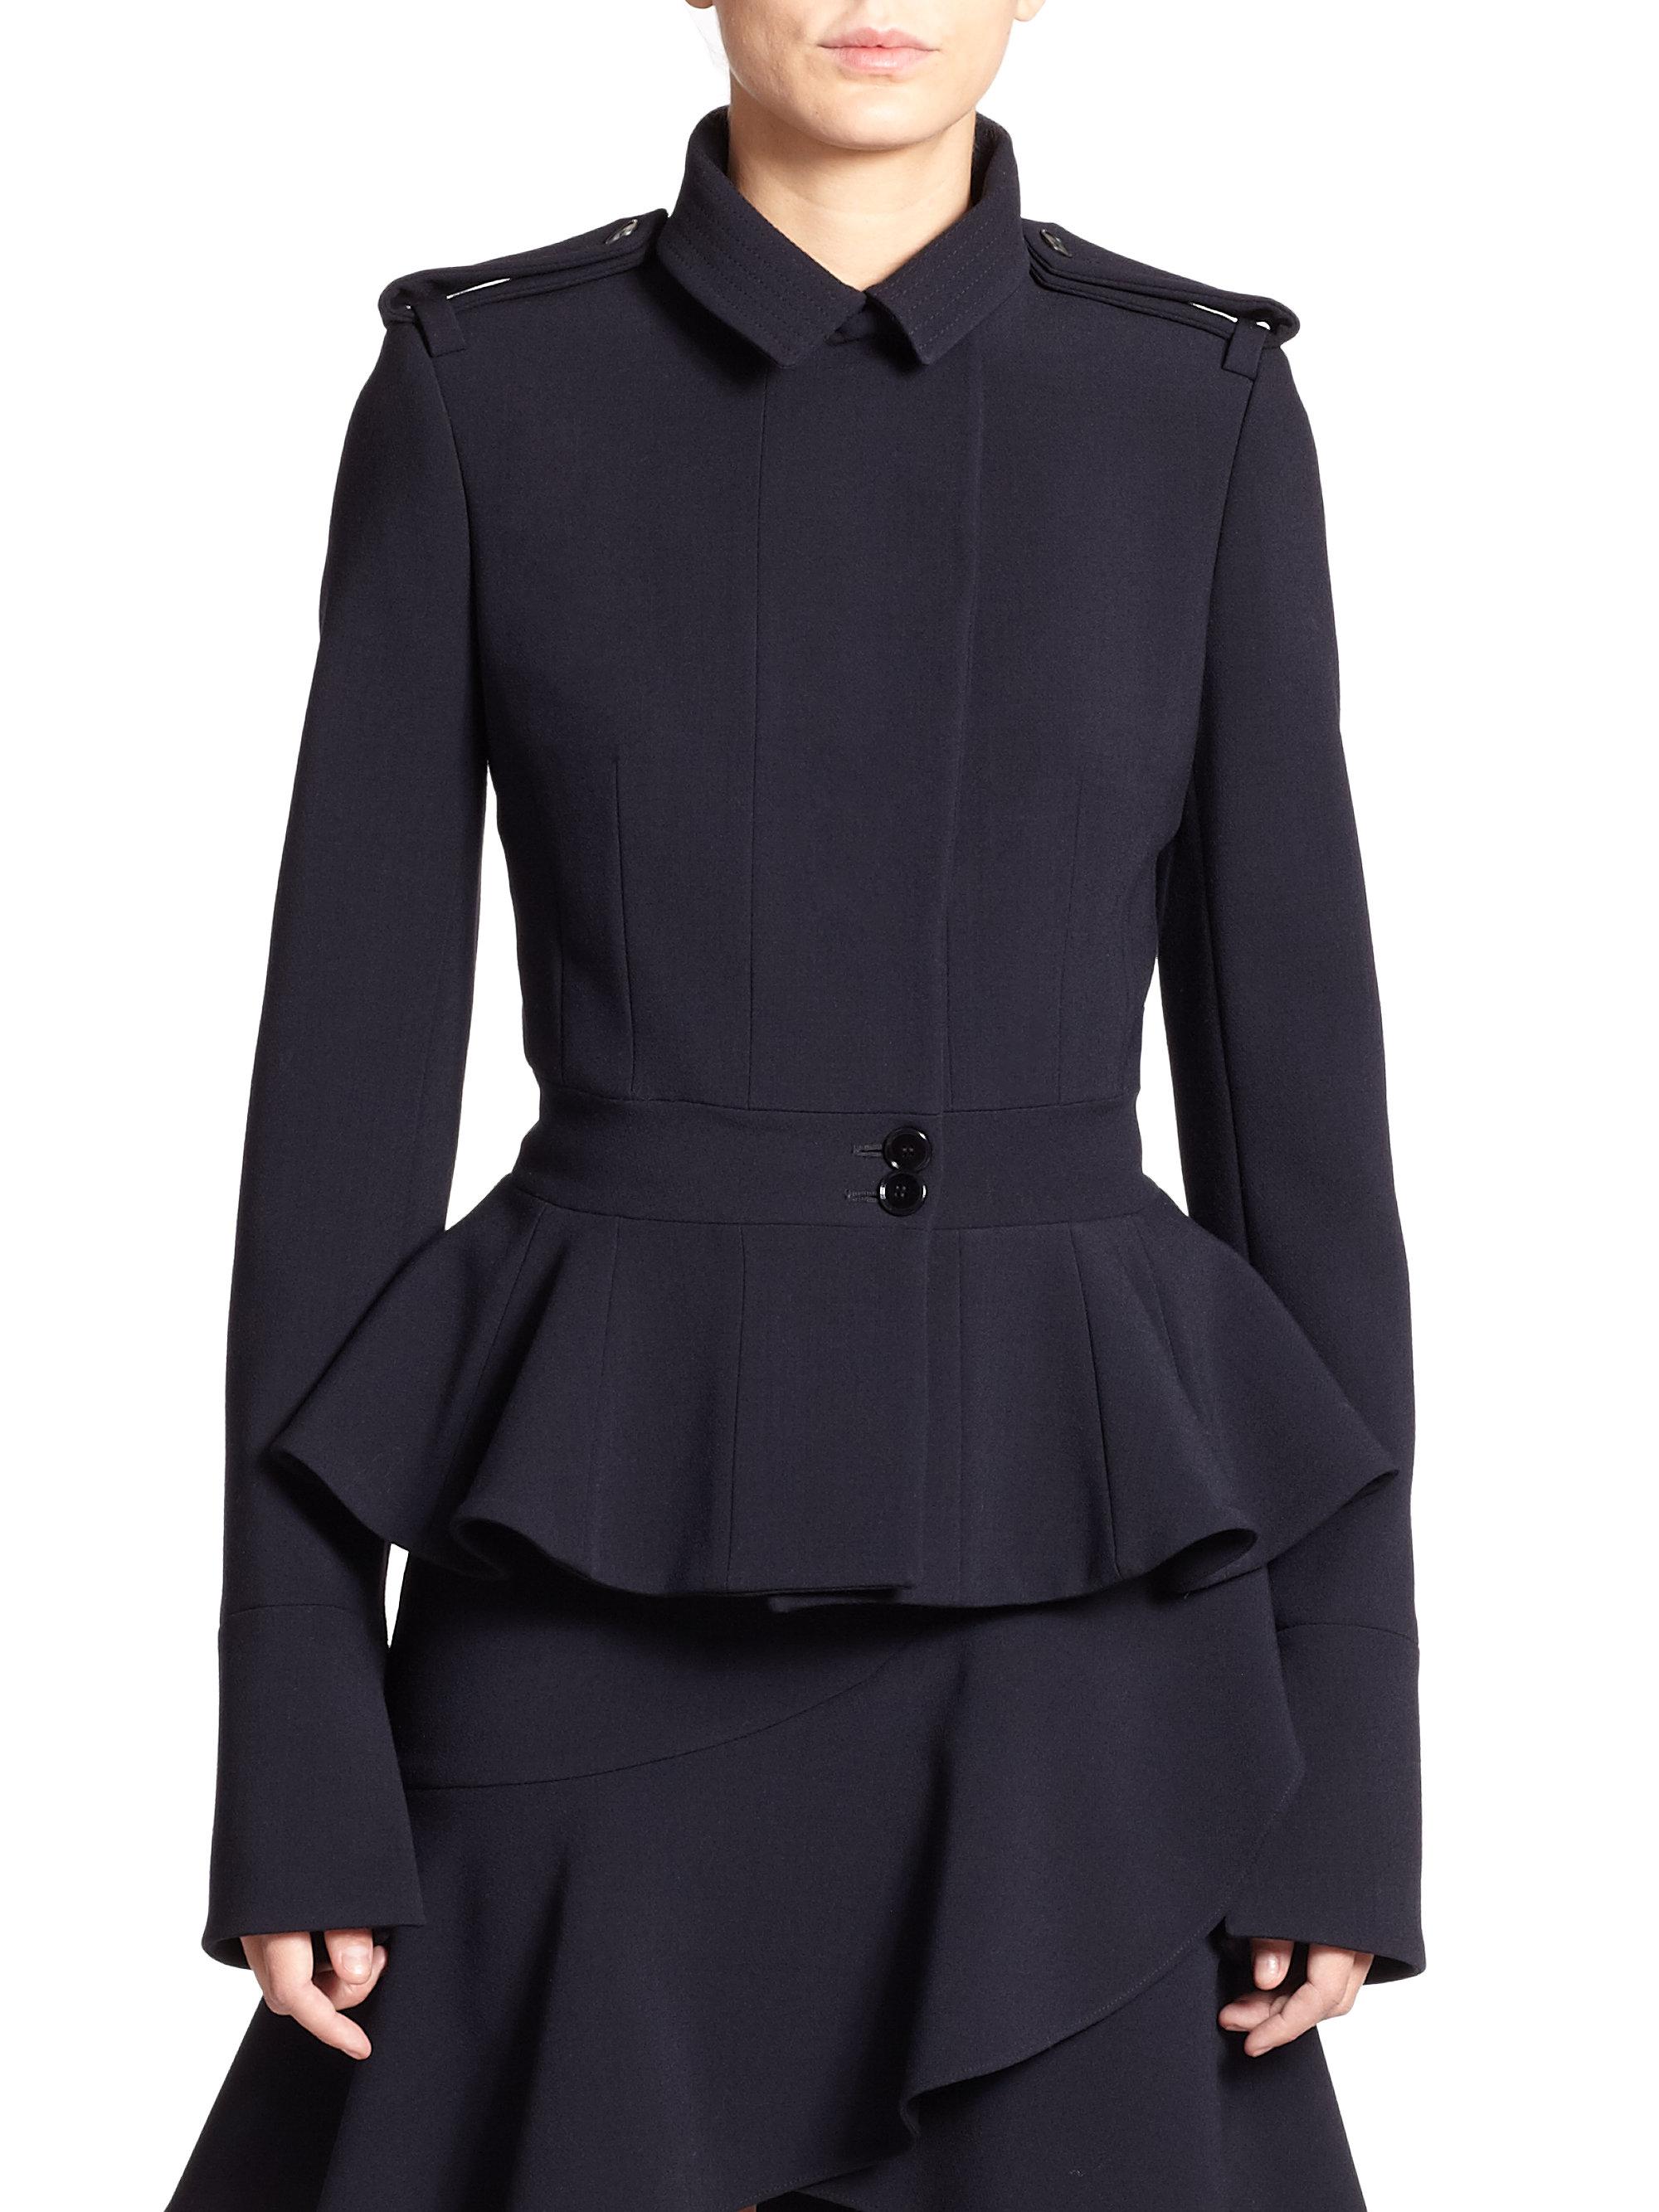 Northface Womens Jackets